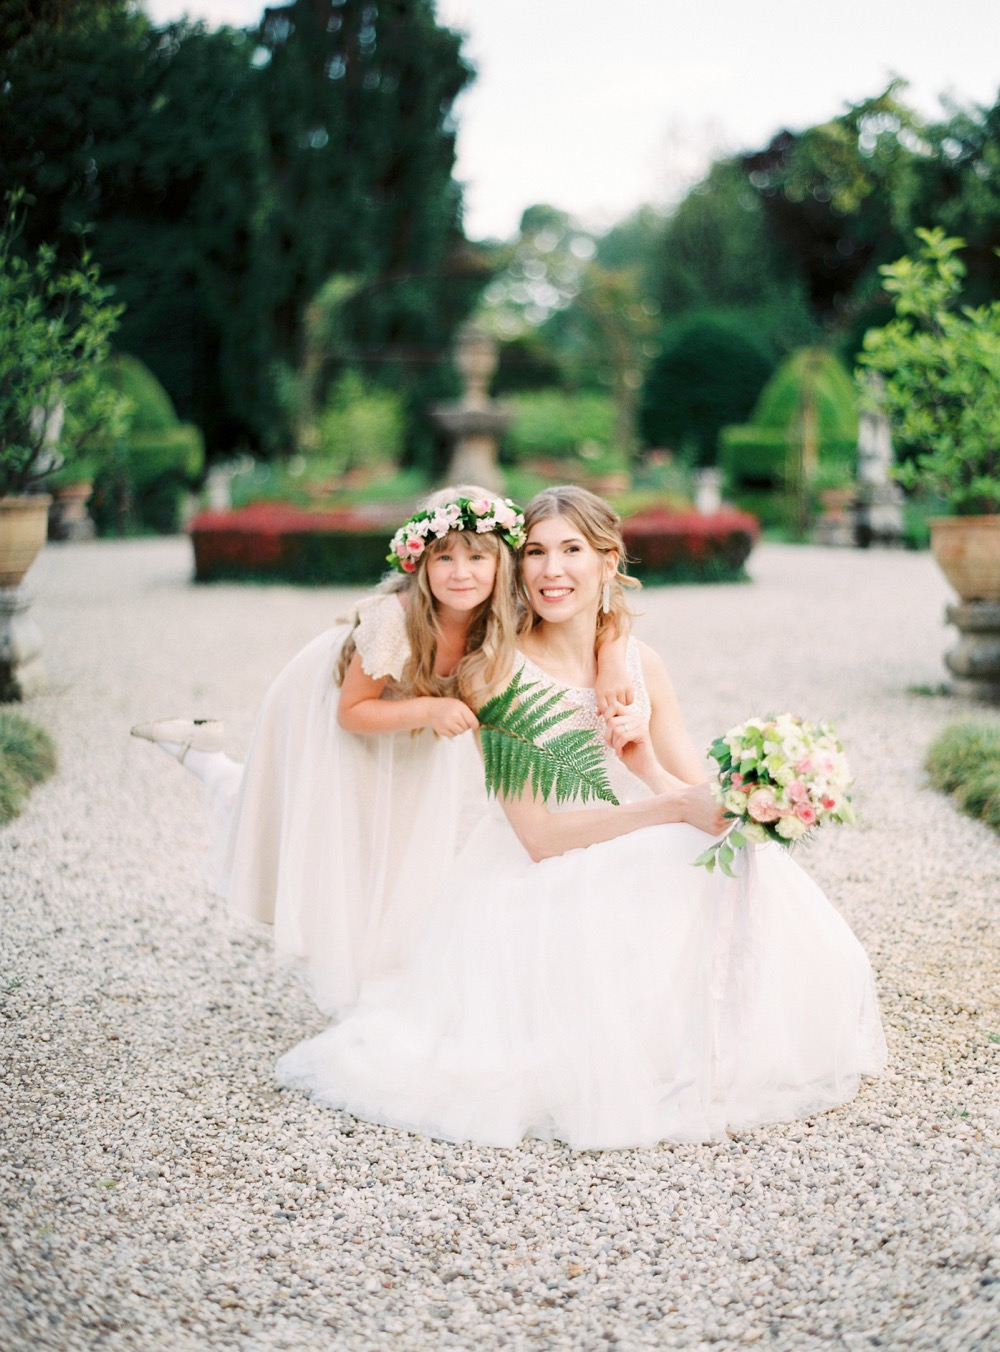 darya kamalova thecablookfotolab fine art film fhotographer in italy destination wedding como lake villa regina teodolinda villa pisani scalabrin-113